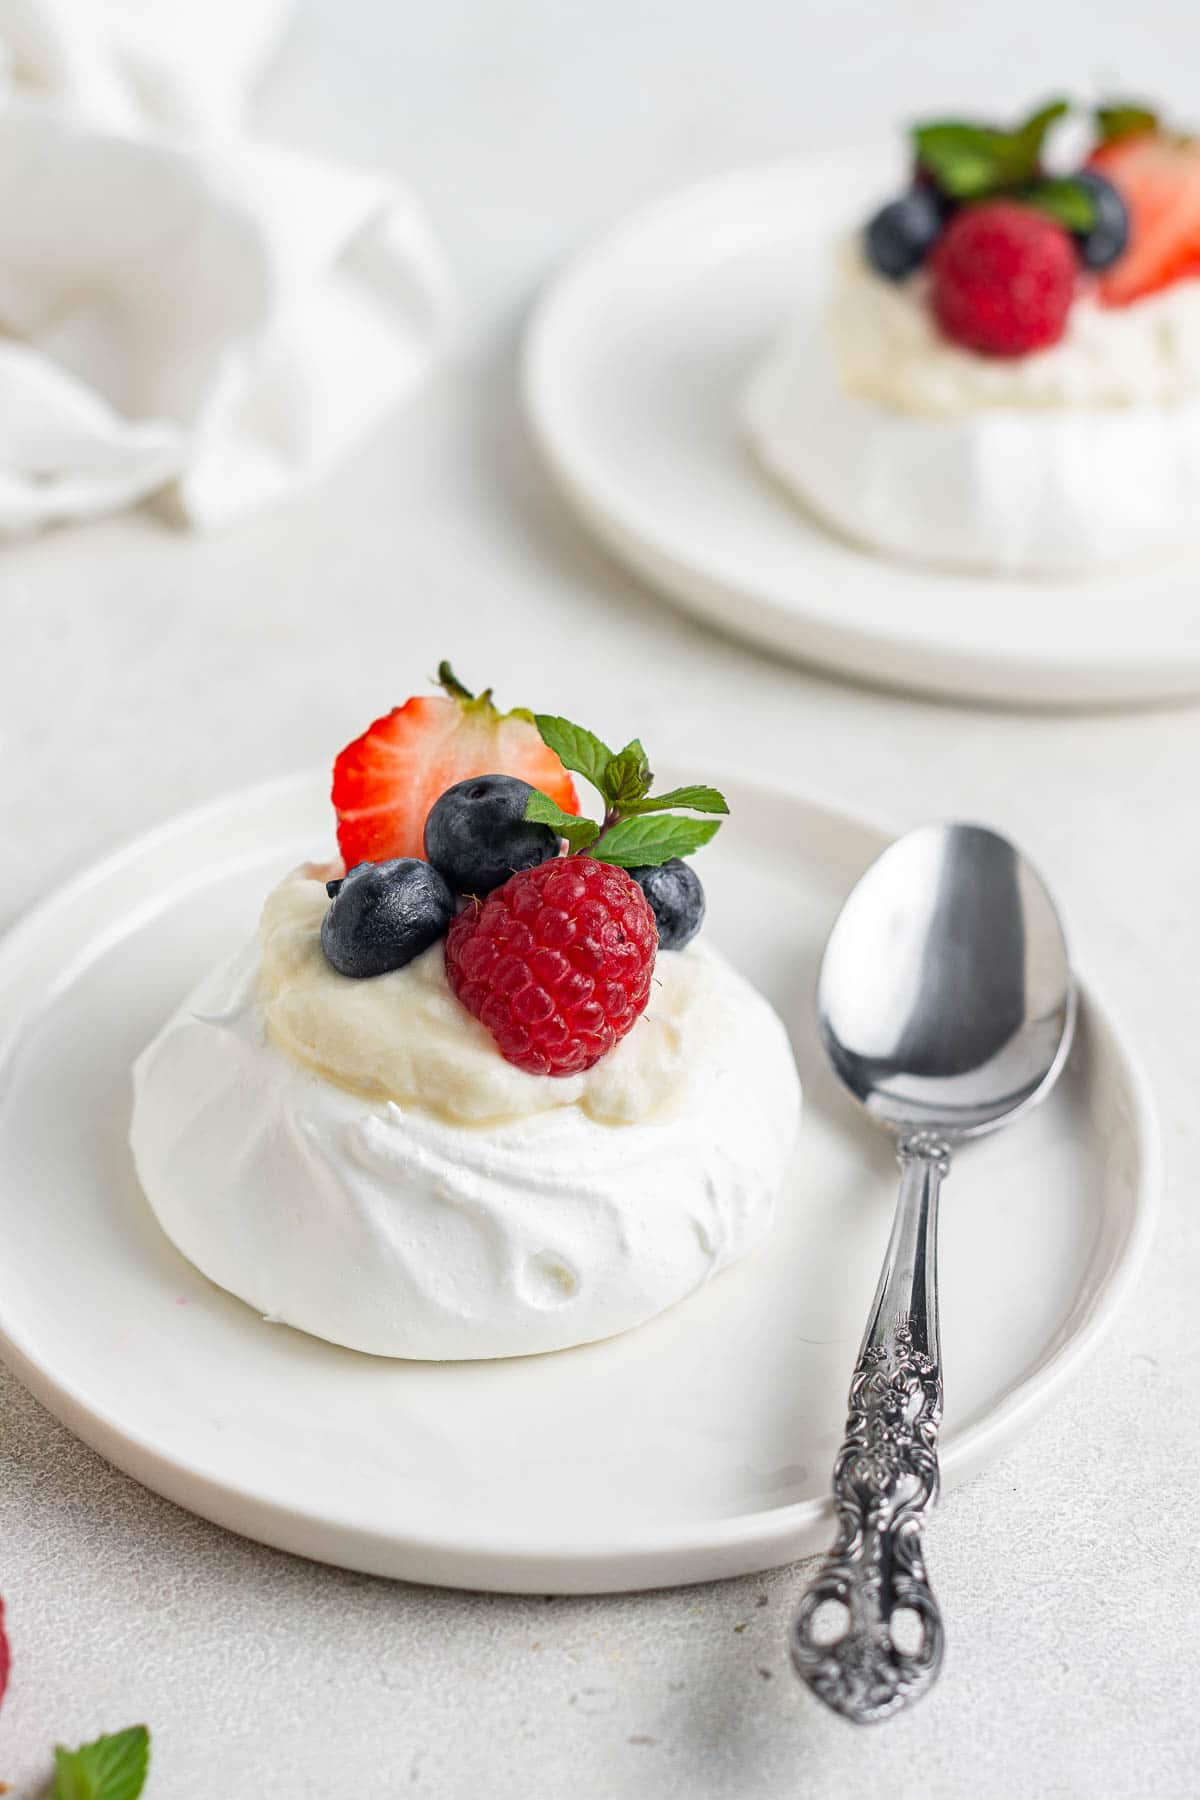 Mini pavlova on white plate with fresh berries on top.